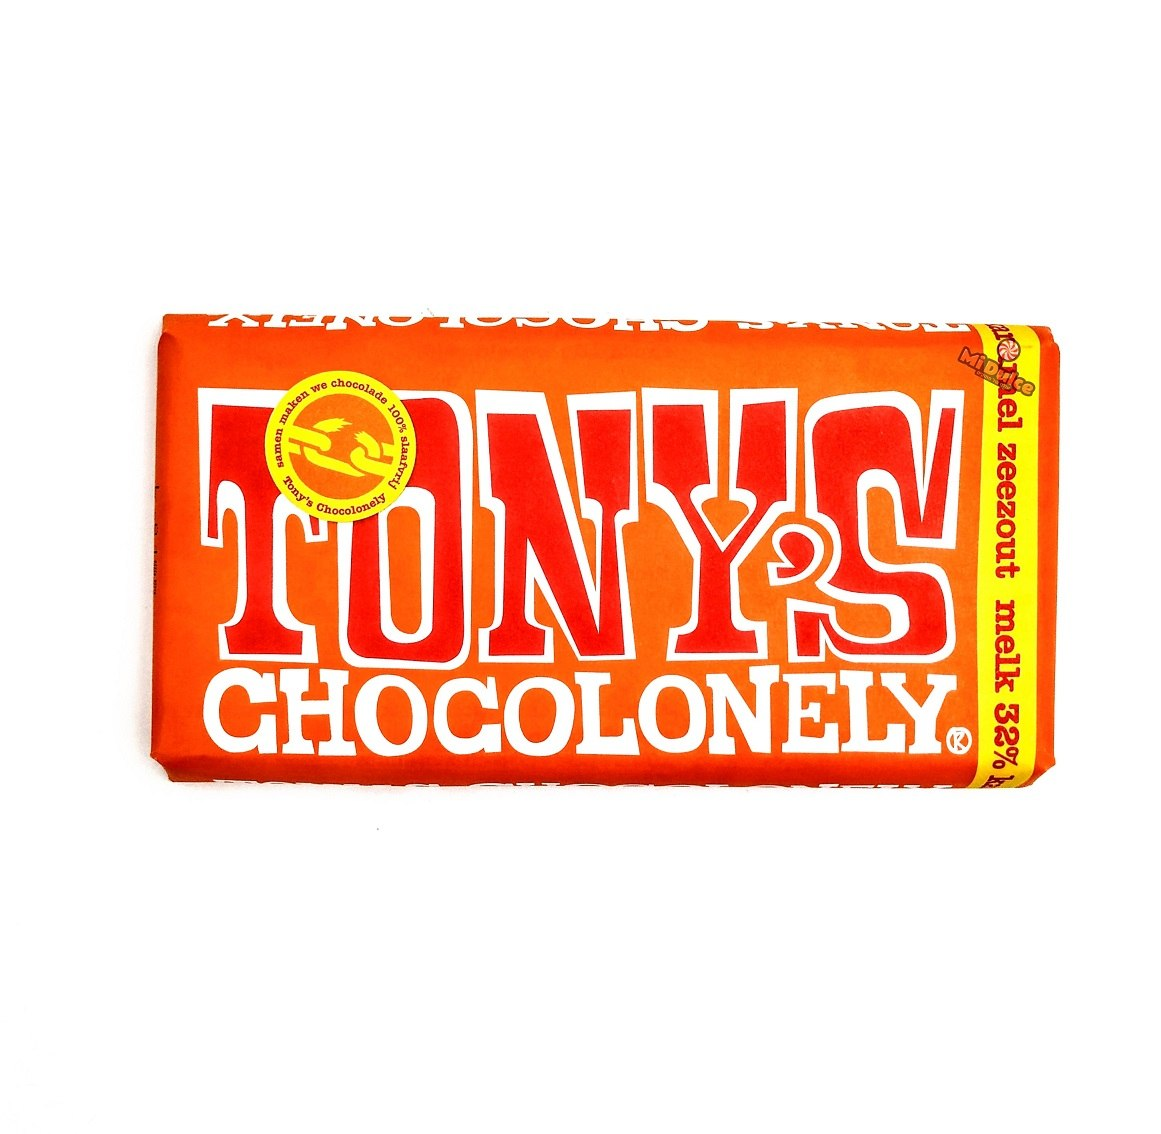 Tony's Chocolonely שוקולד חלב קרמל מלוח (100% free slave)